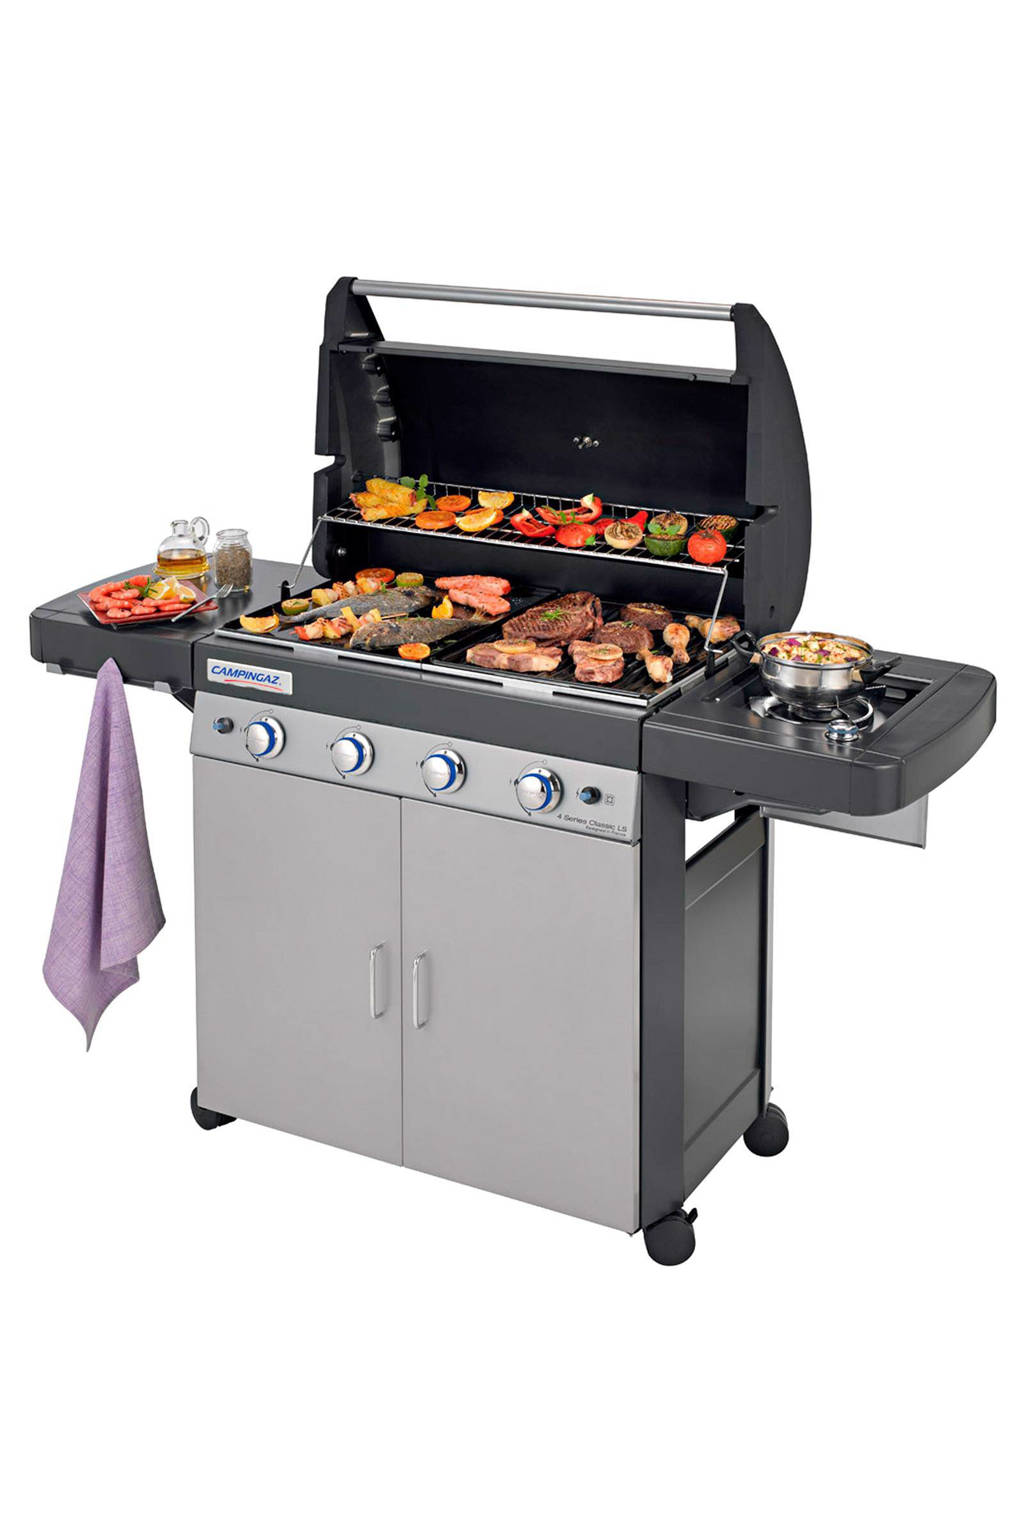 Campingaz 4 series Classic LS gasbarbecue, Grijs